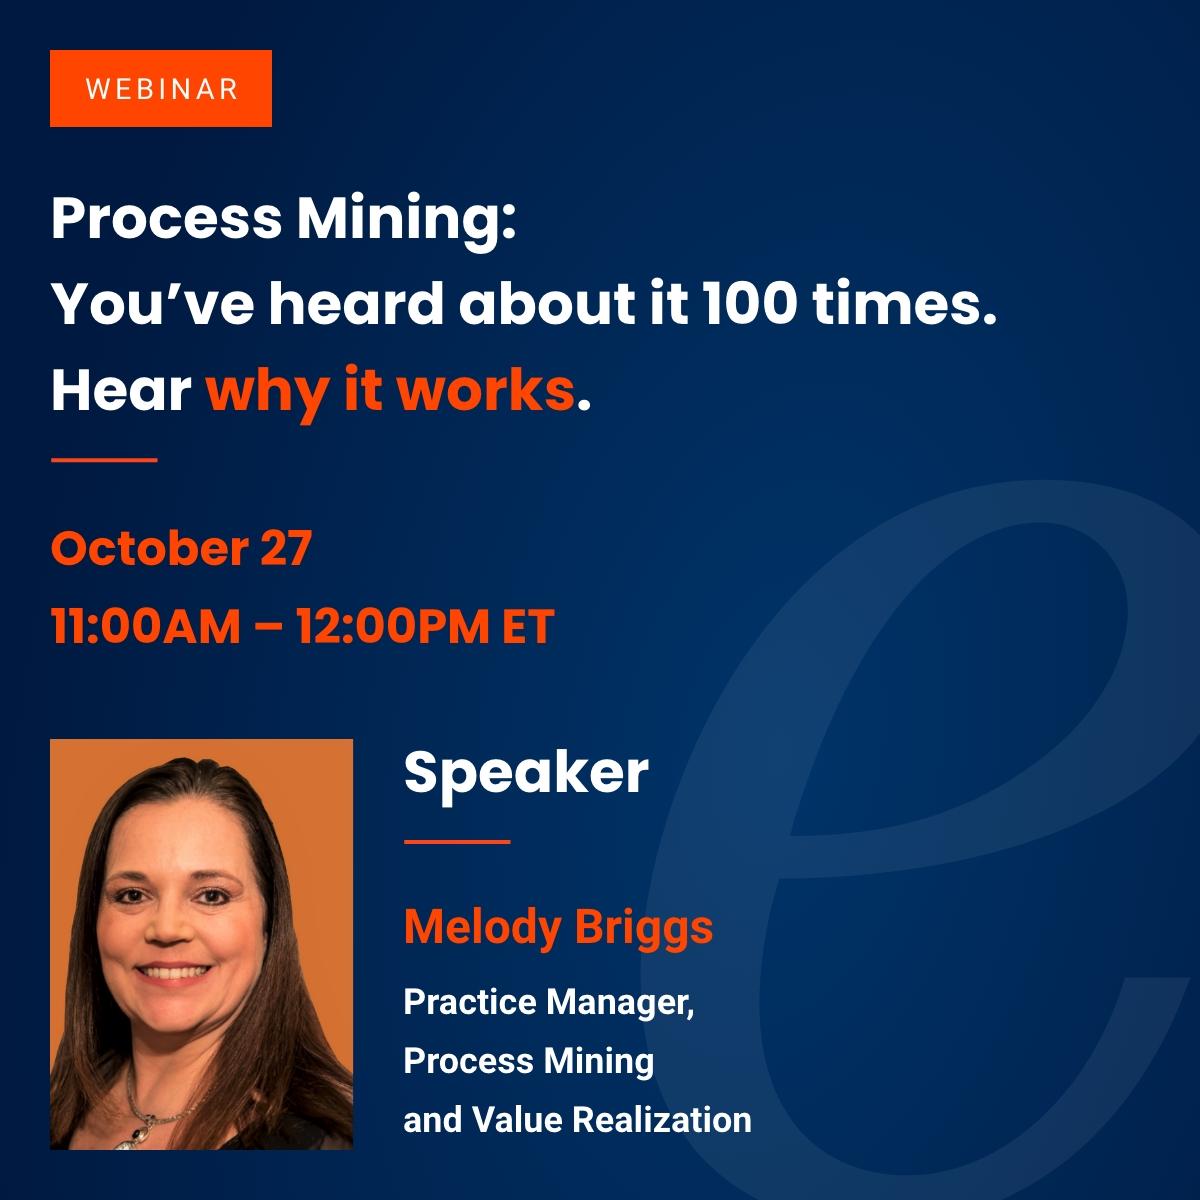 Webinar: Process Mining, you've heard about it 100 times, hear why it works.